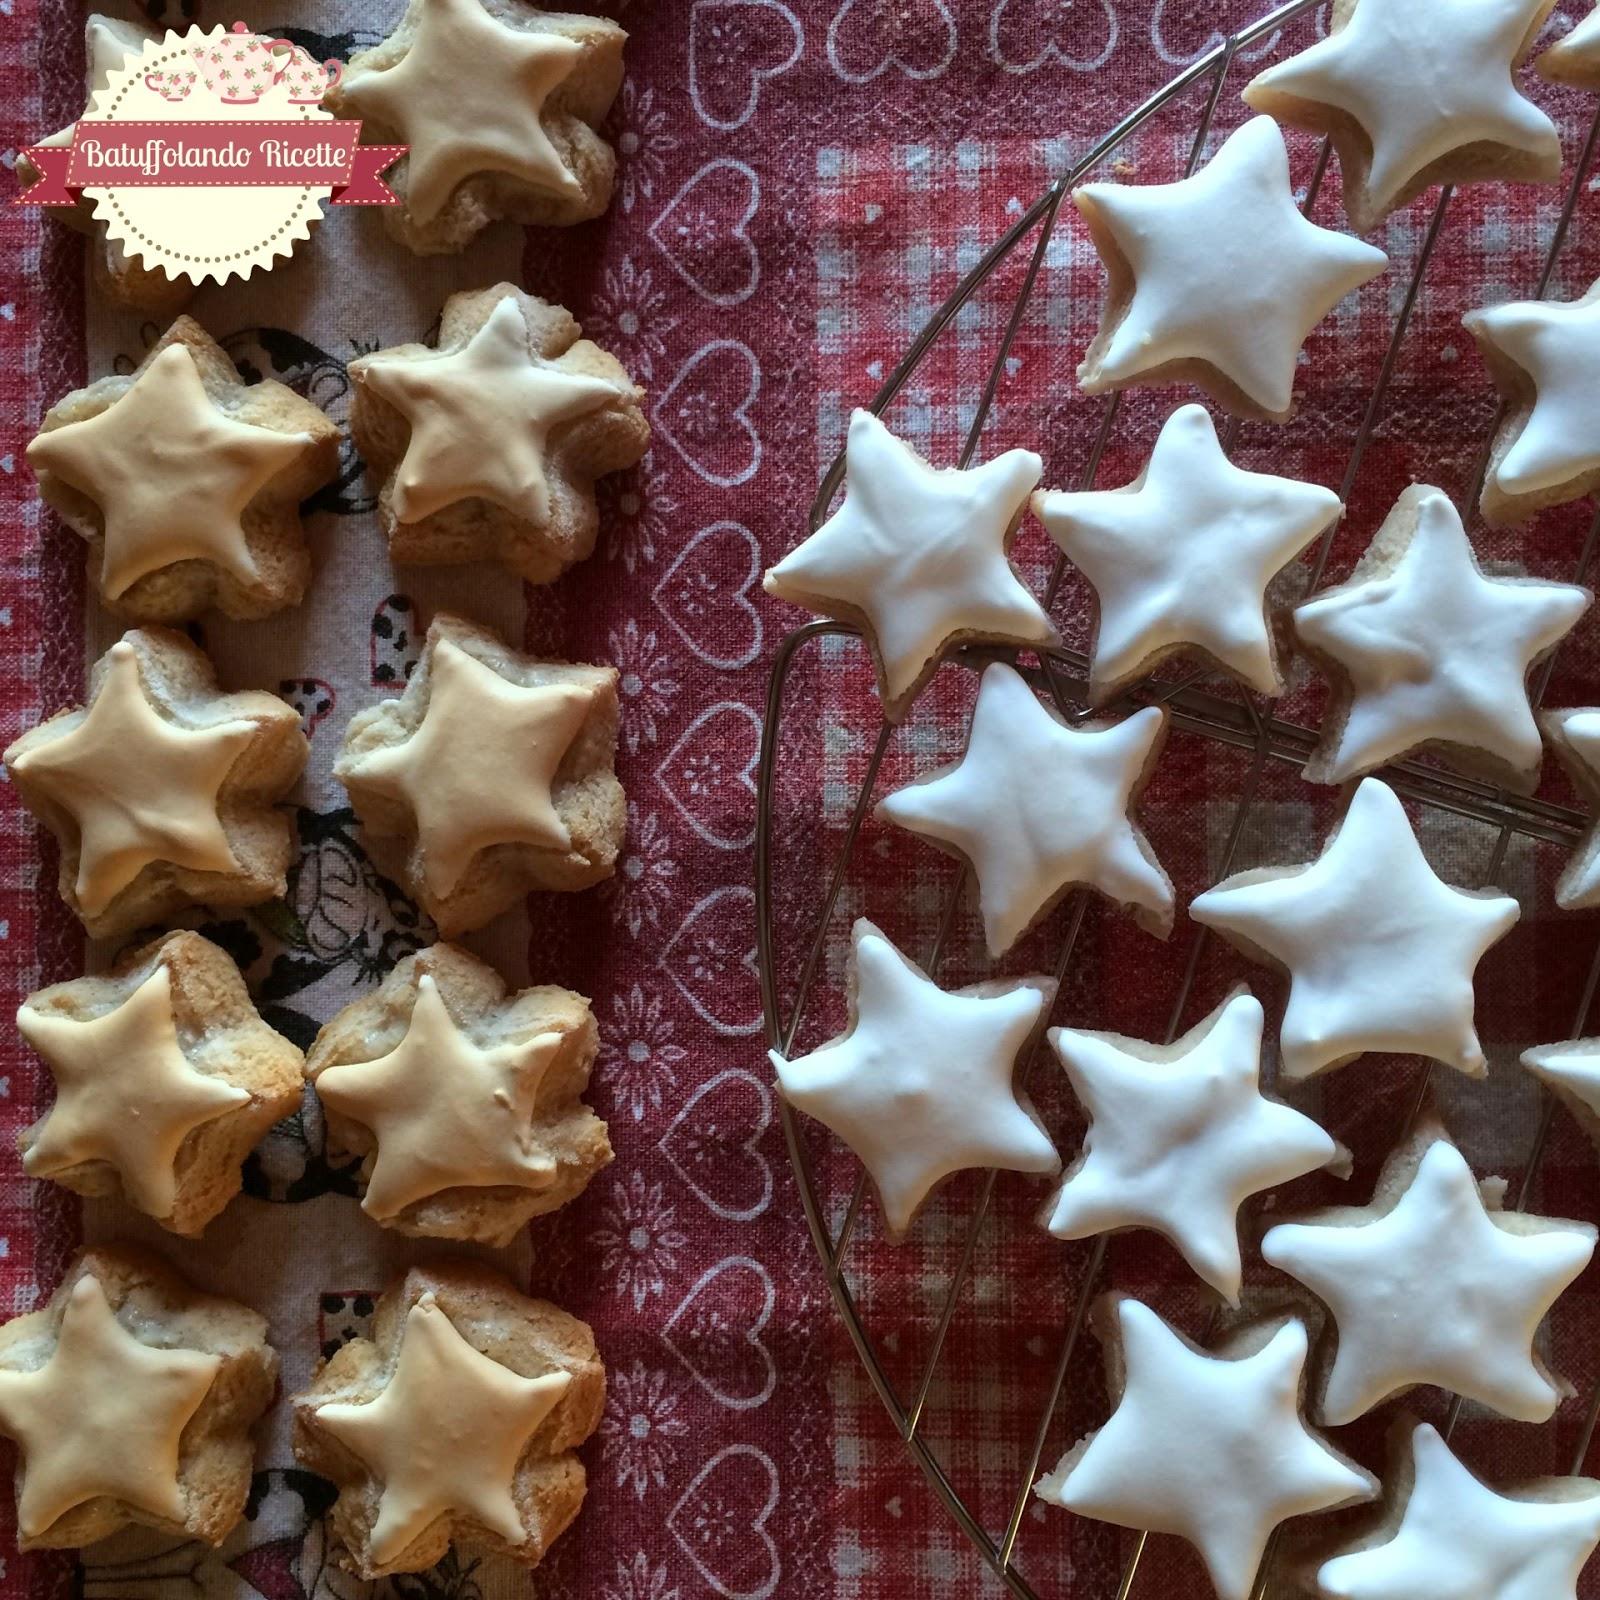 Biscotti Di Natale Zimtsterne.Batuffolando Ricette Zimtsterne Biscotti Svizzeri Natalizi